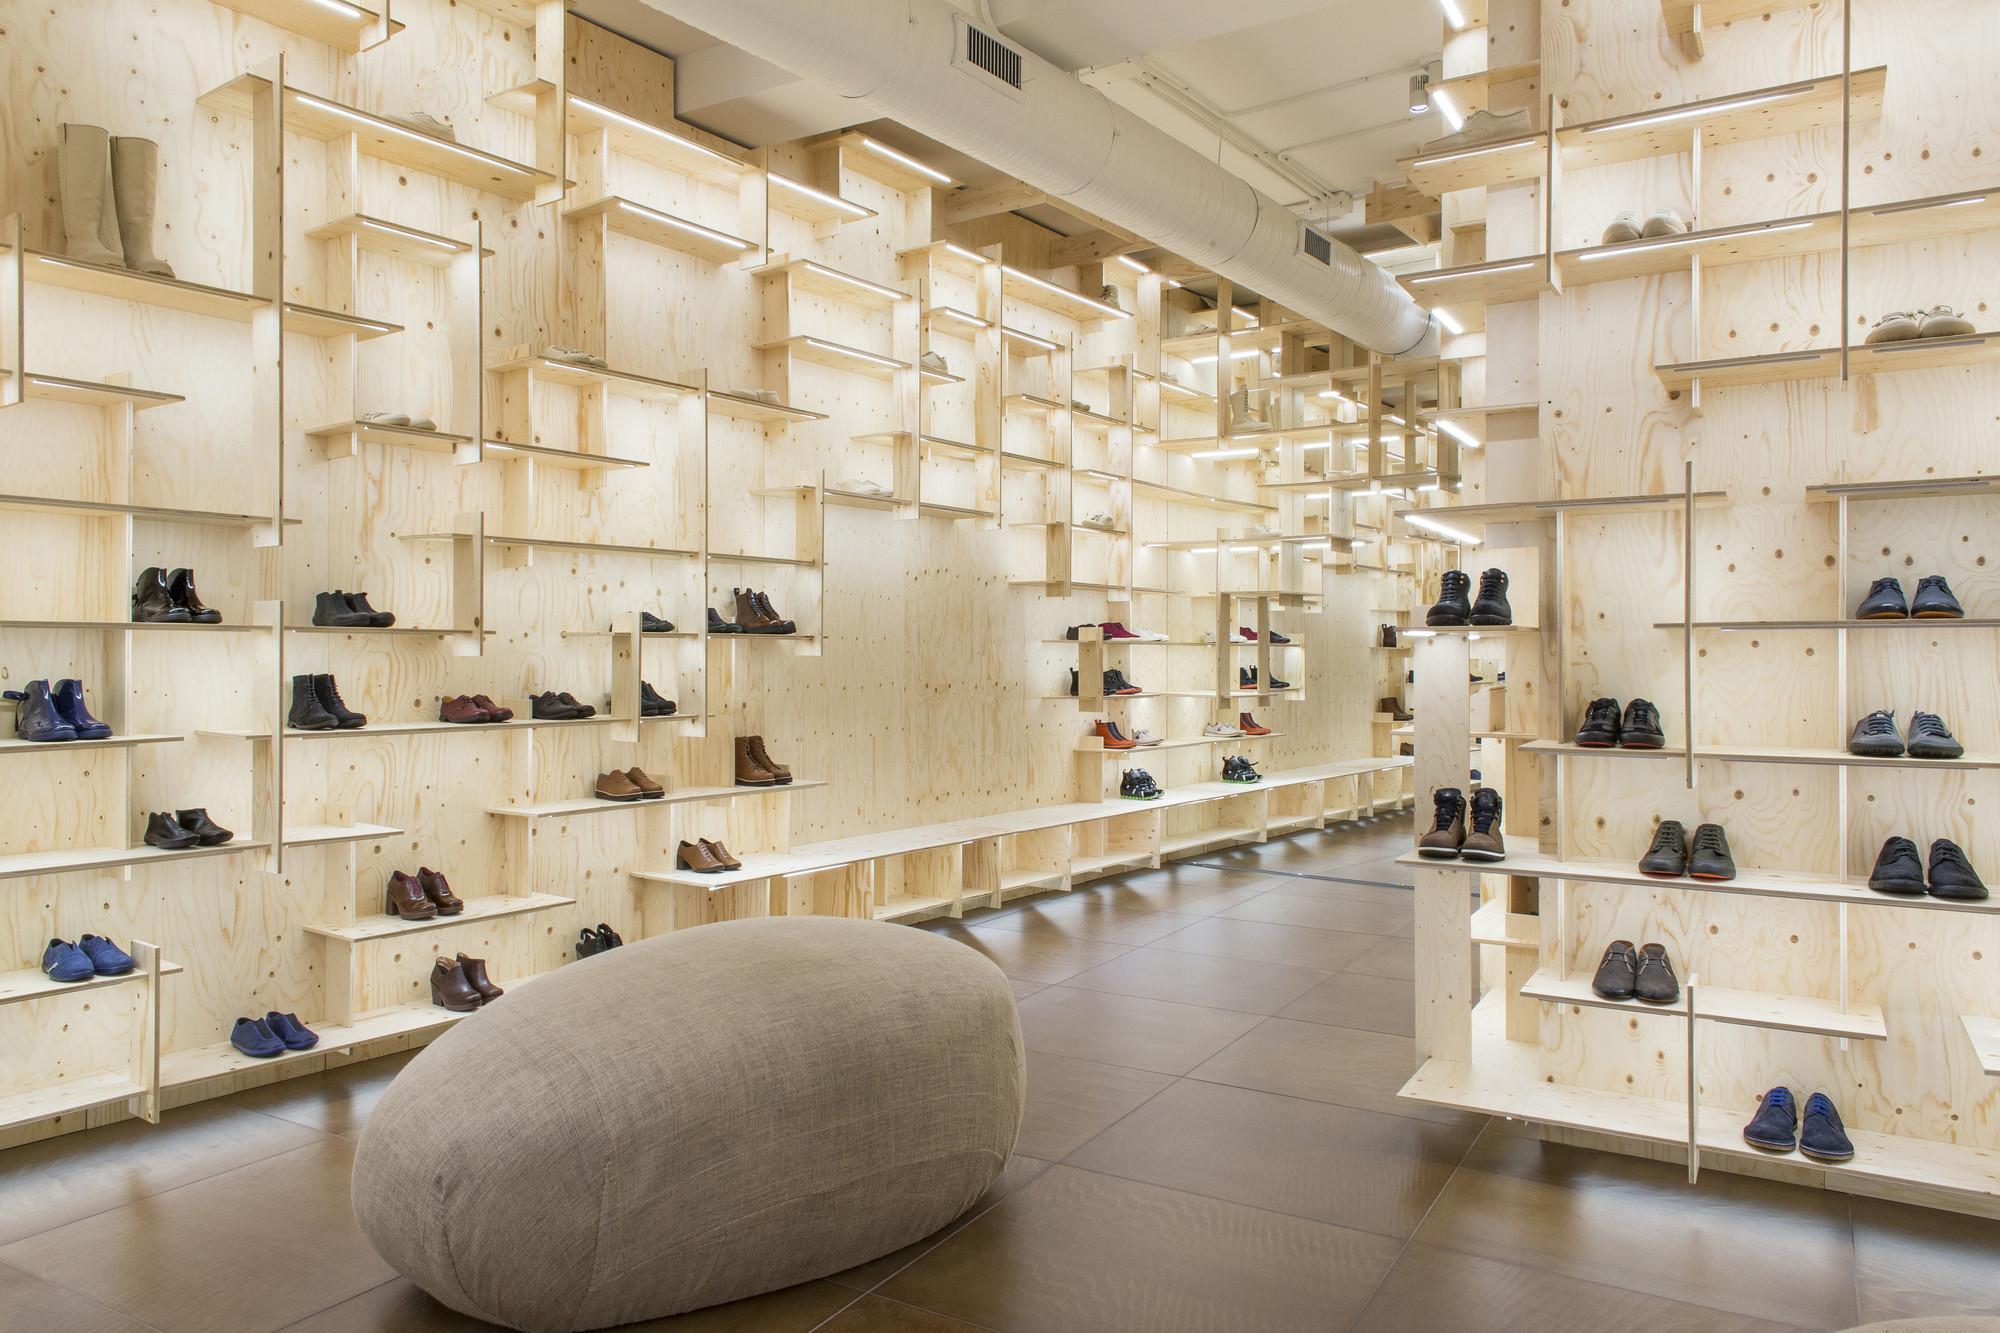 Gallery of camper store milano kengo kuma associates 7 for Milano design shop